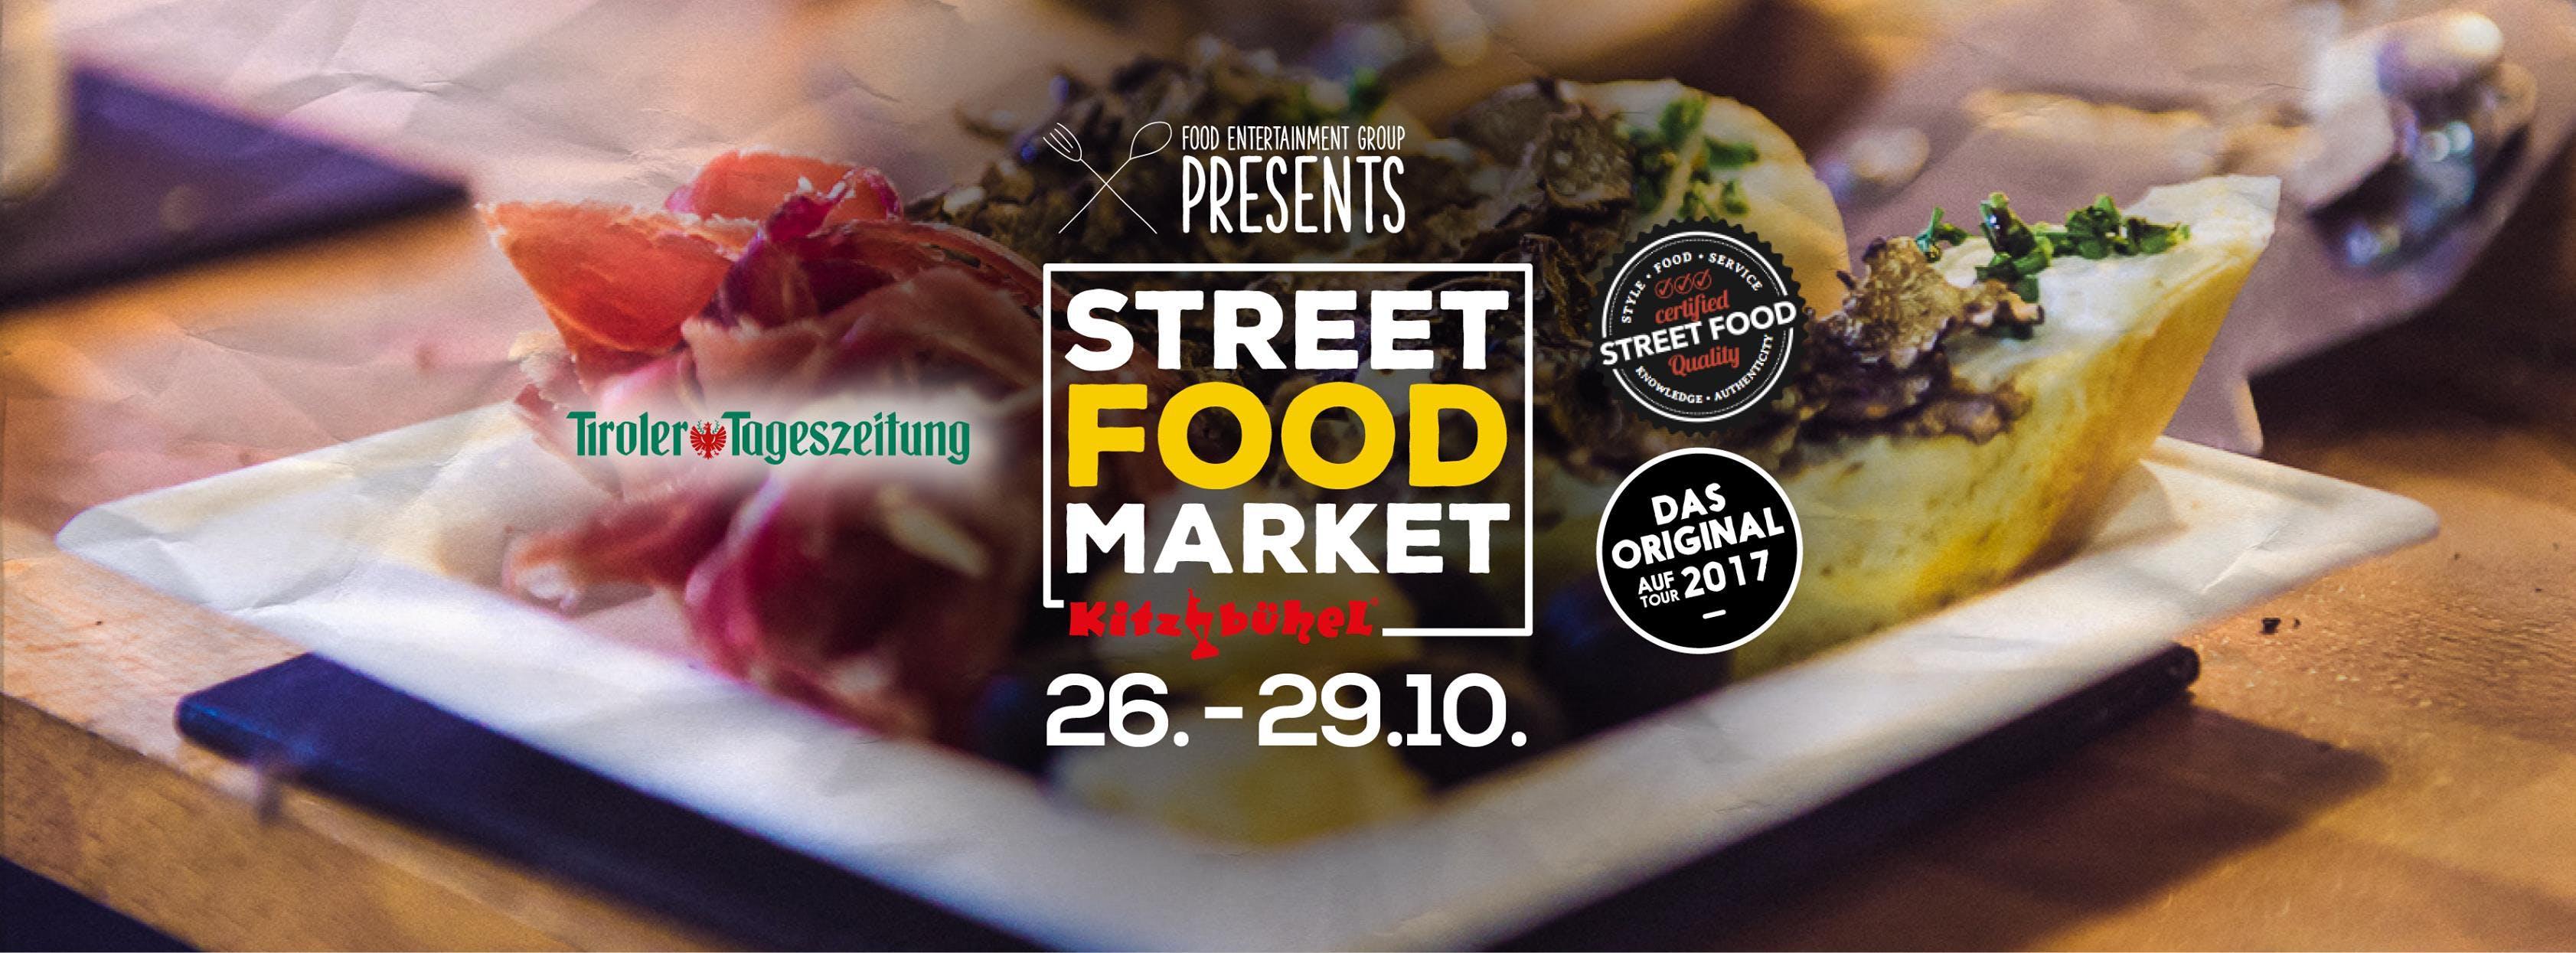 street food market Banner